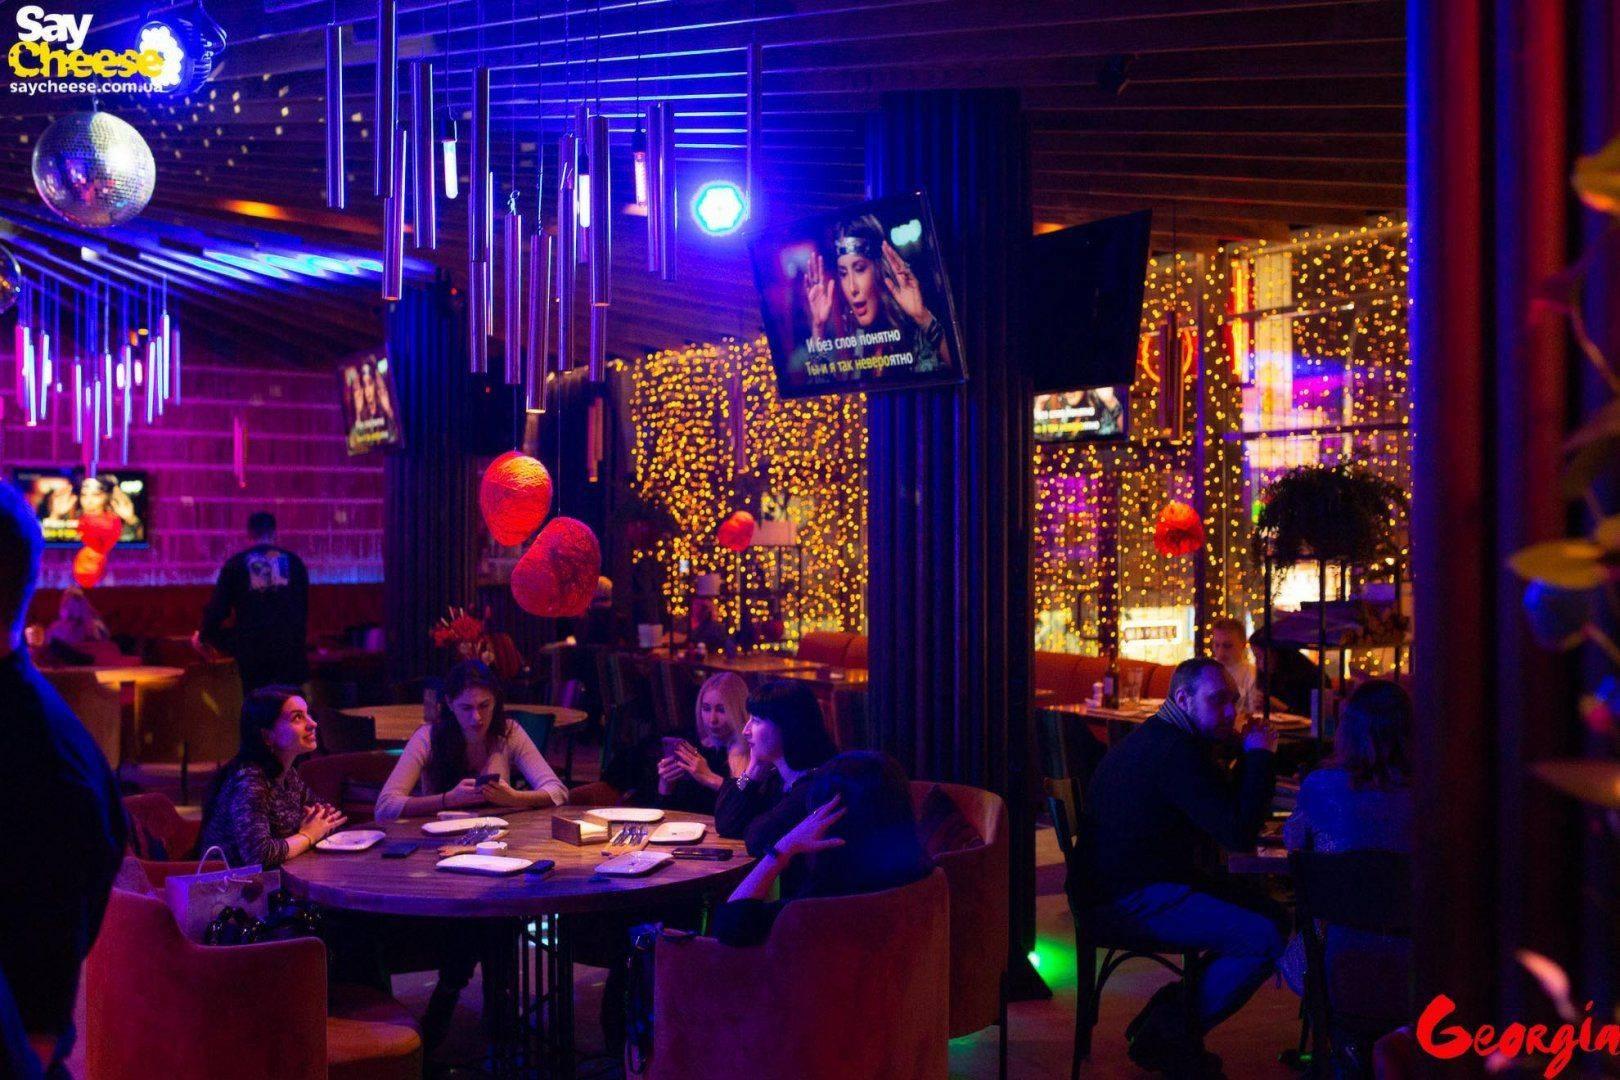 Ресторан Джорджия Харьков фотоотчет Saycheese 12.02